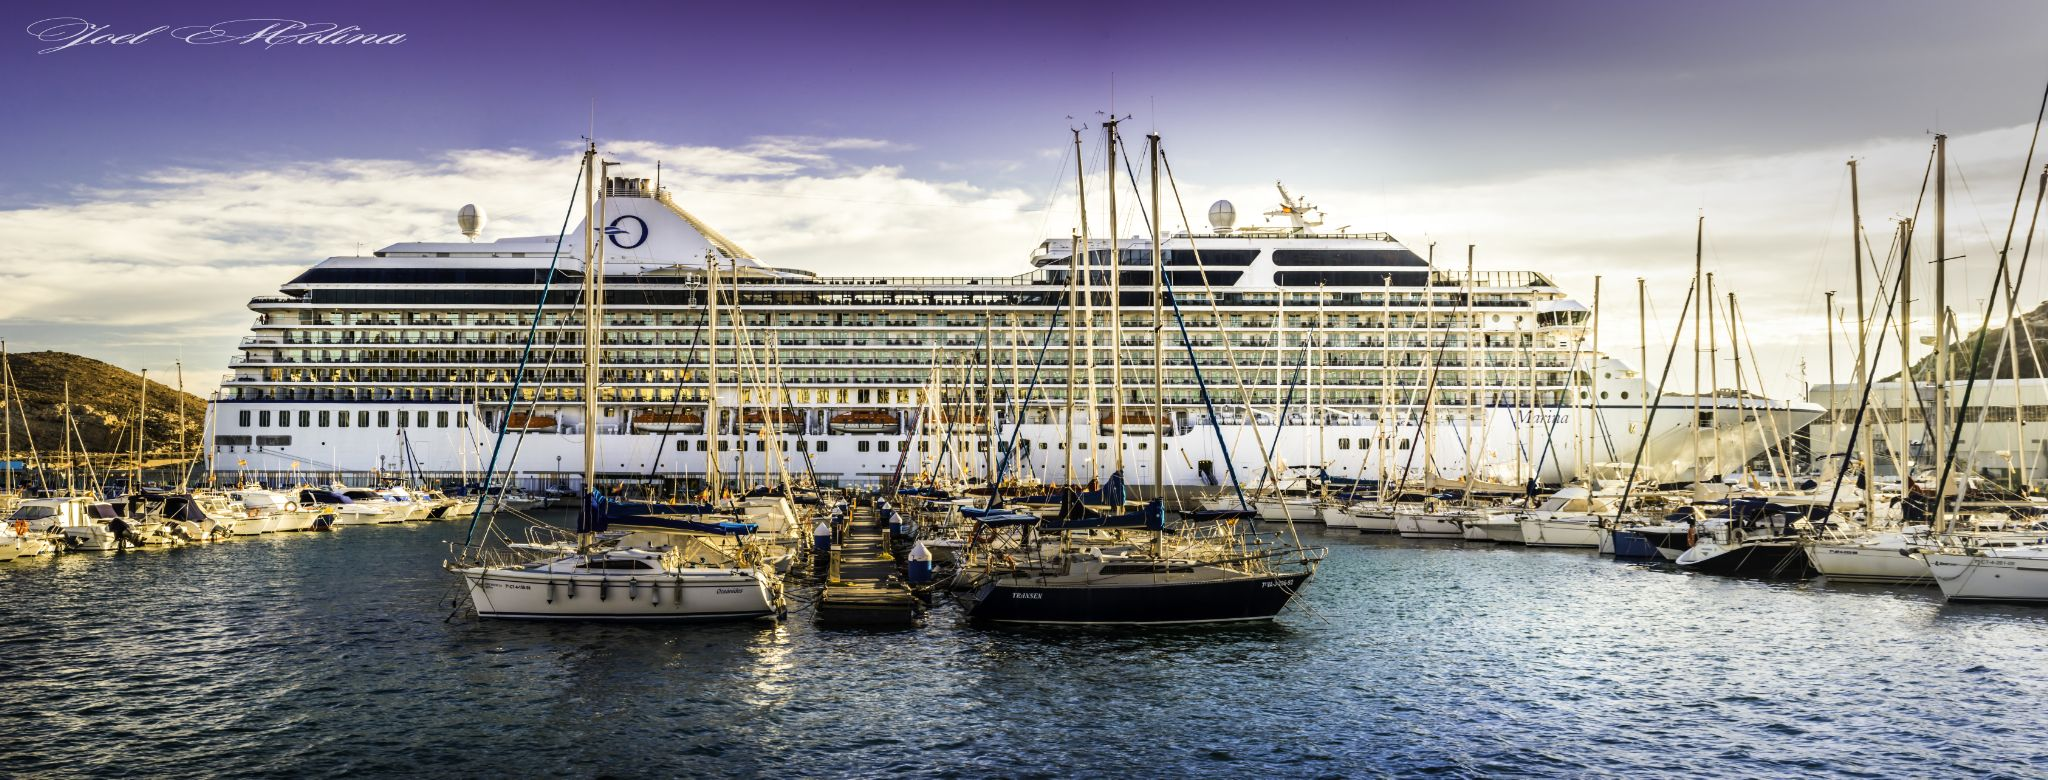 Ship in Cartagena by joelmolinaphotography